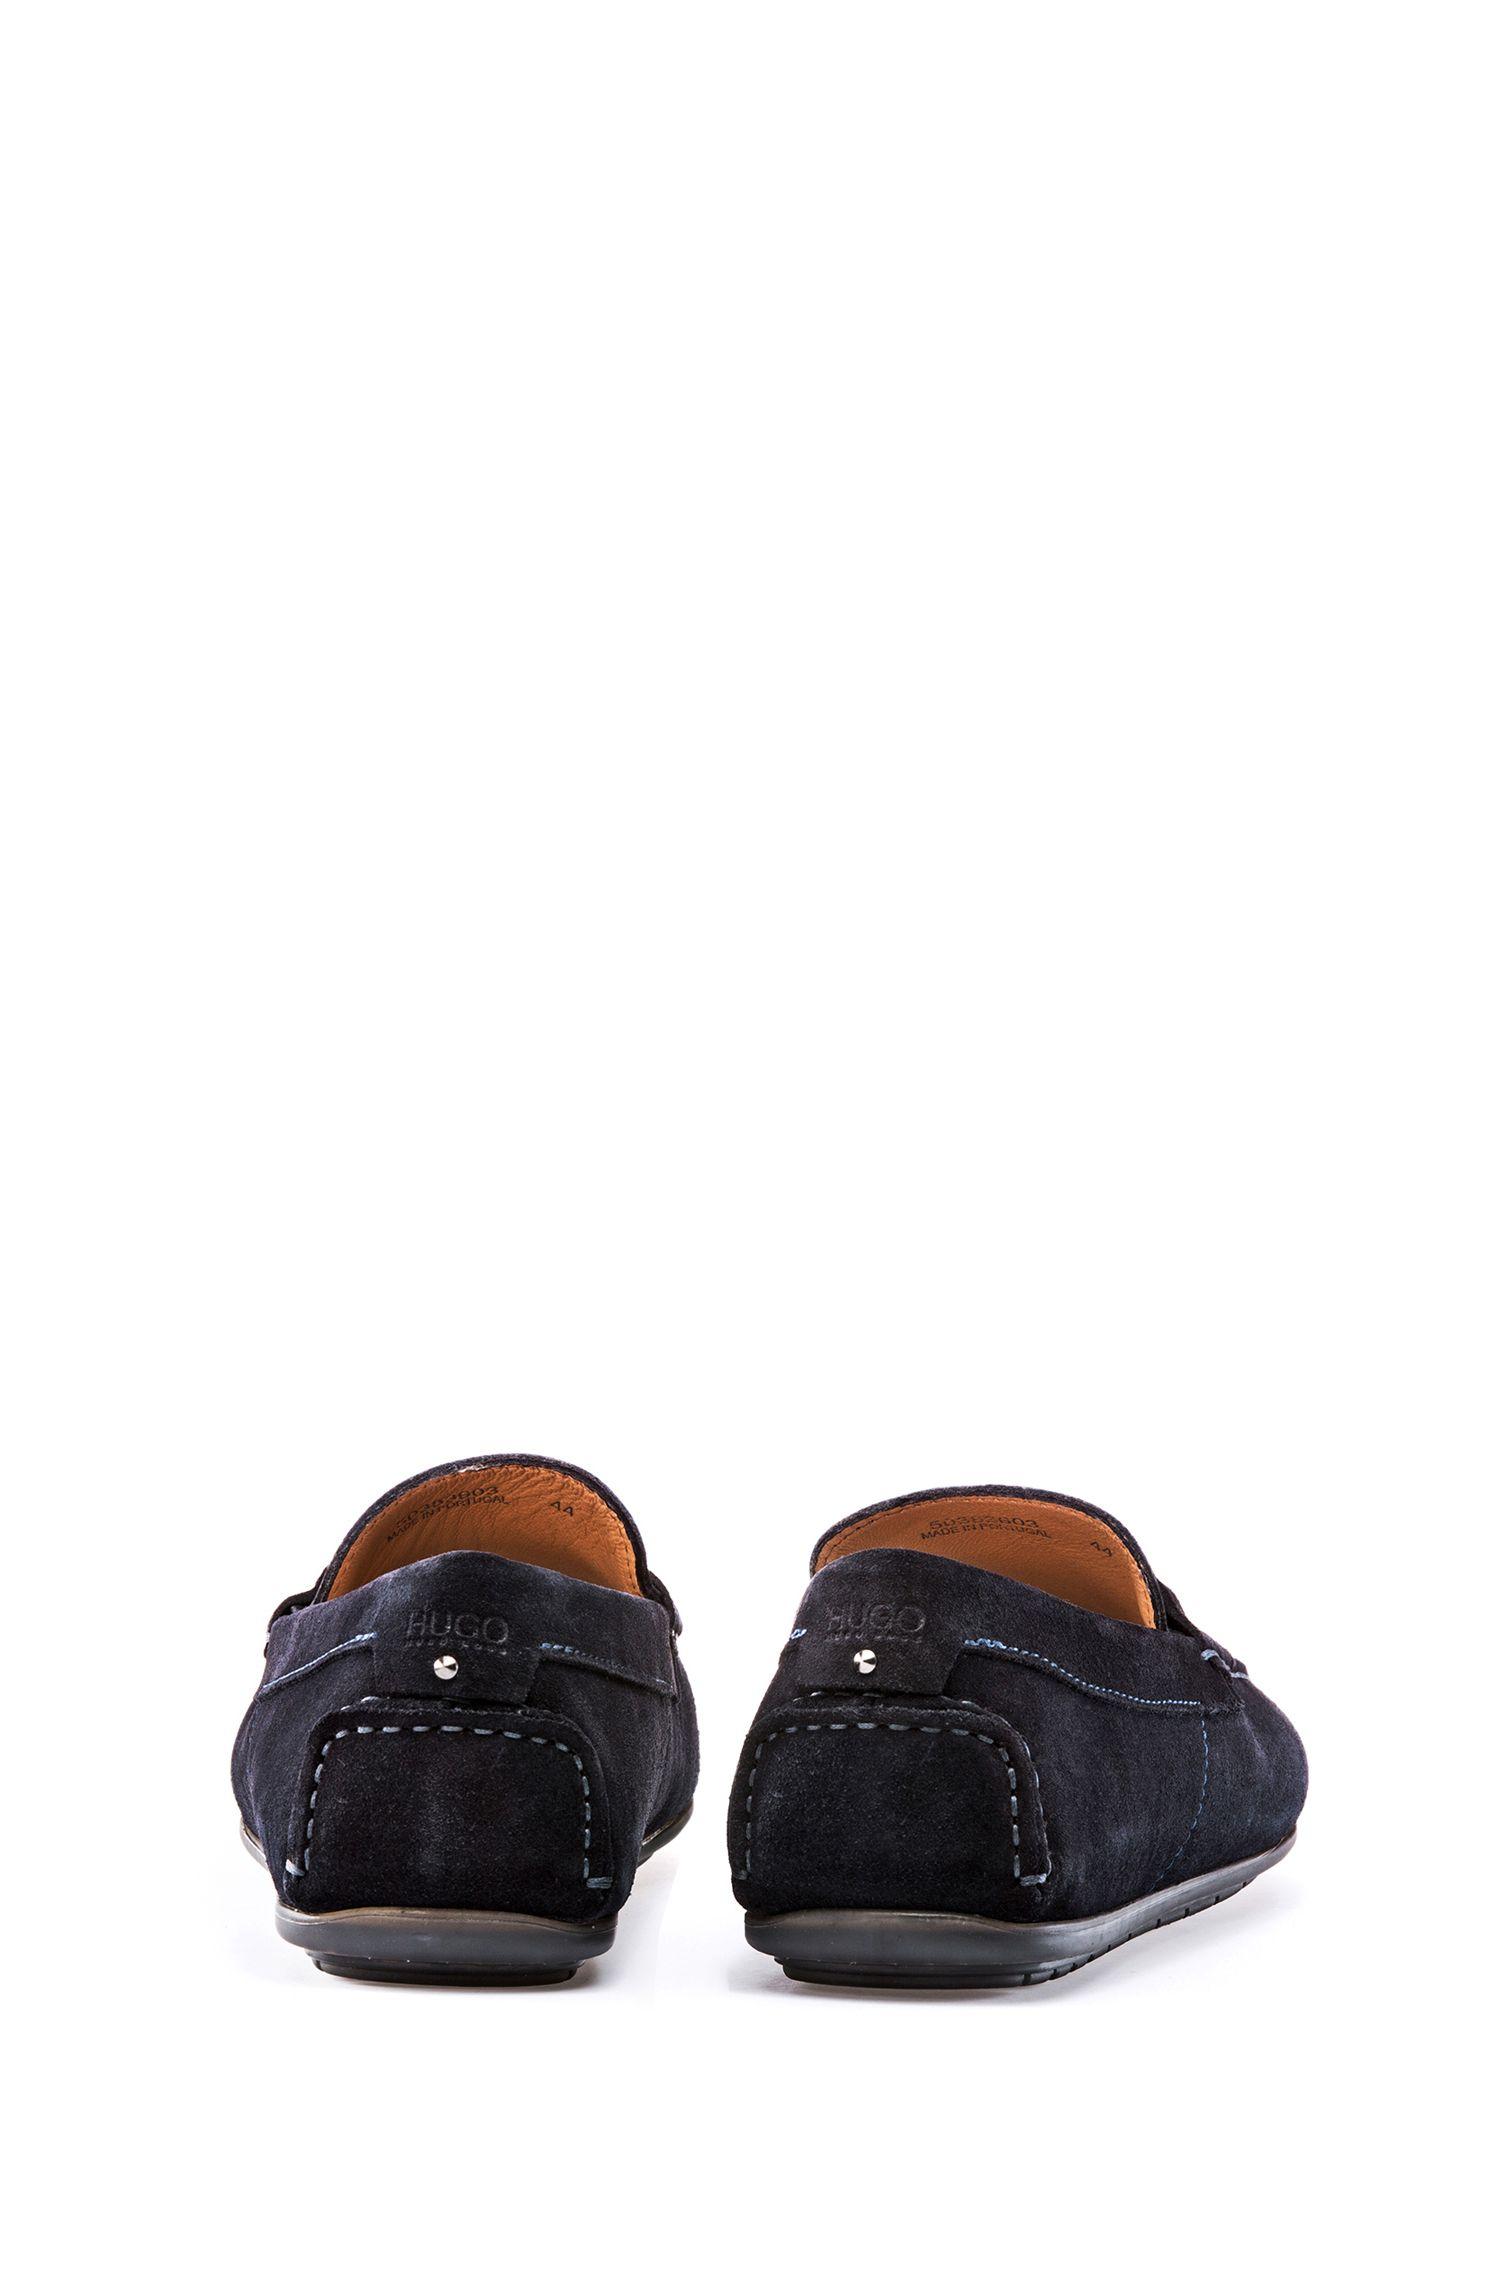 Mokassins aus Veloursleder mit strukturiertem Schuhblatt